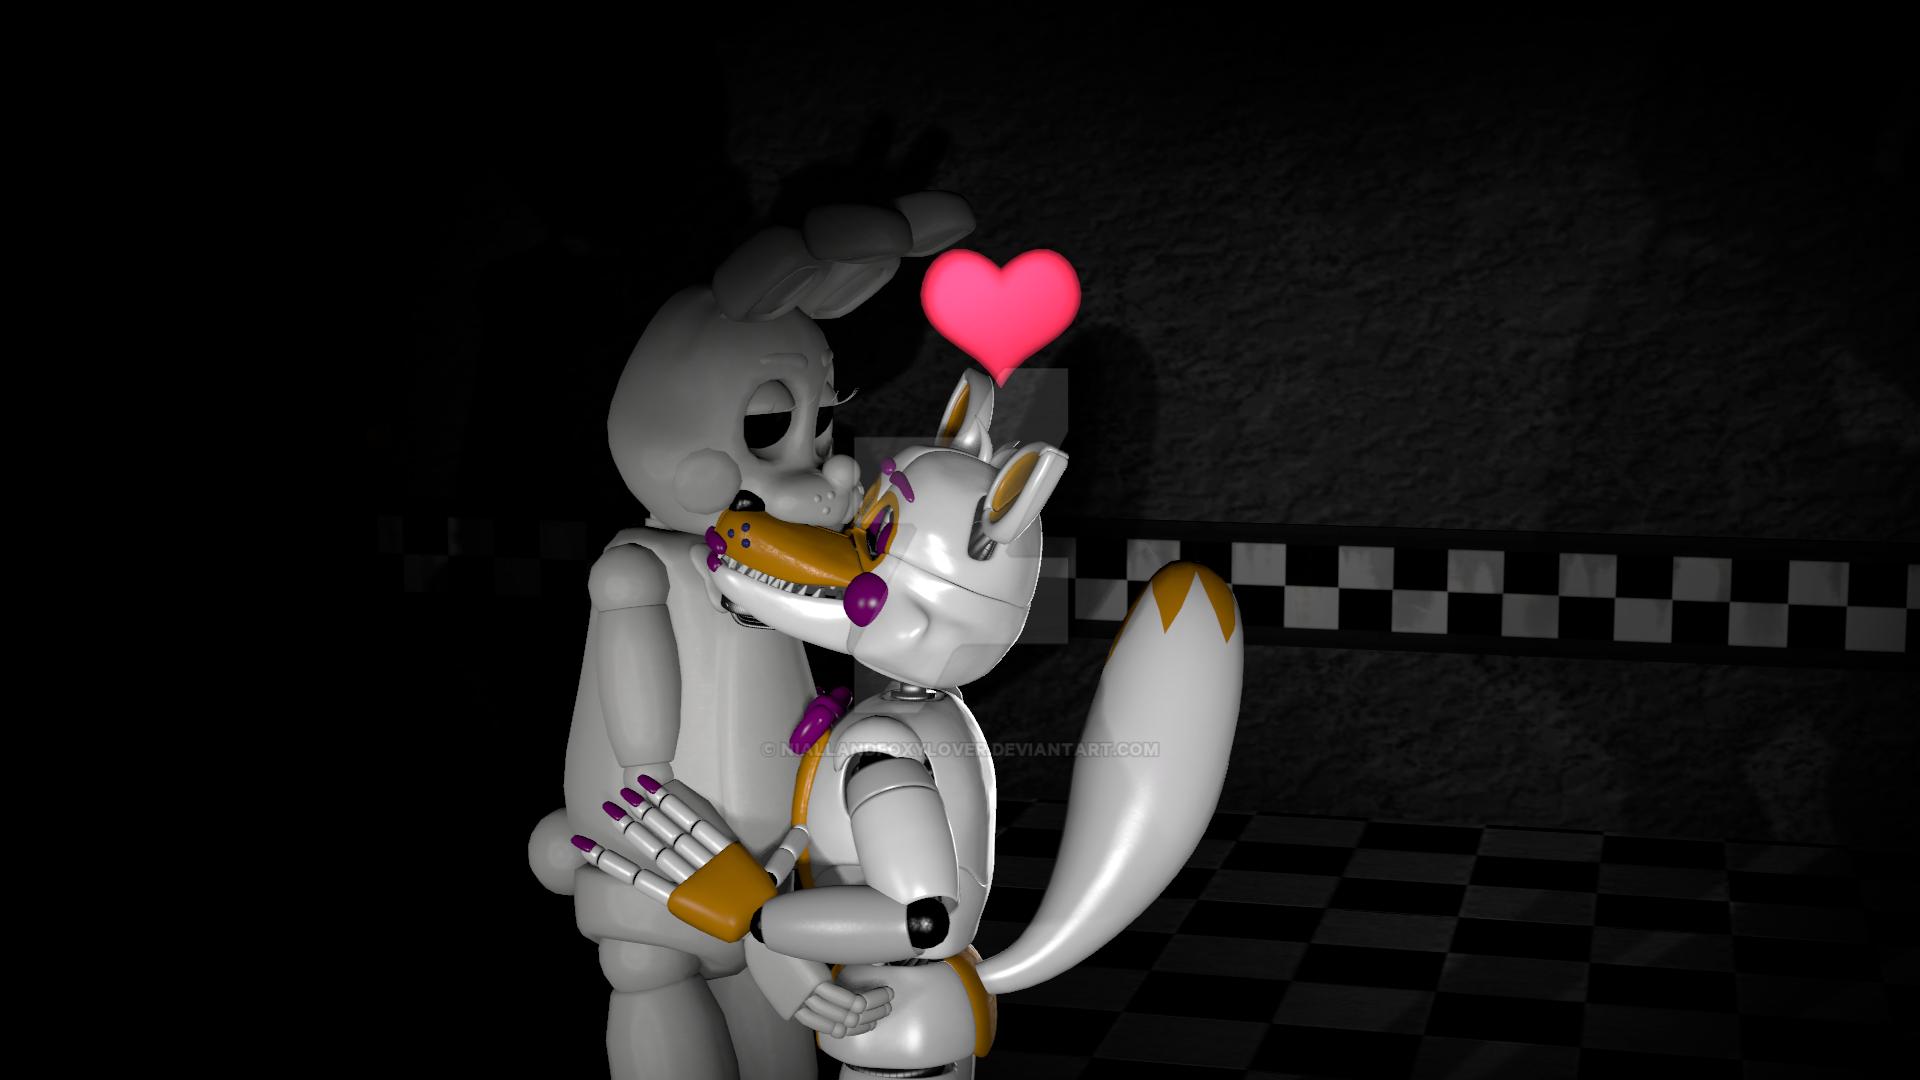 White rabbit porn review